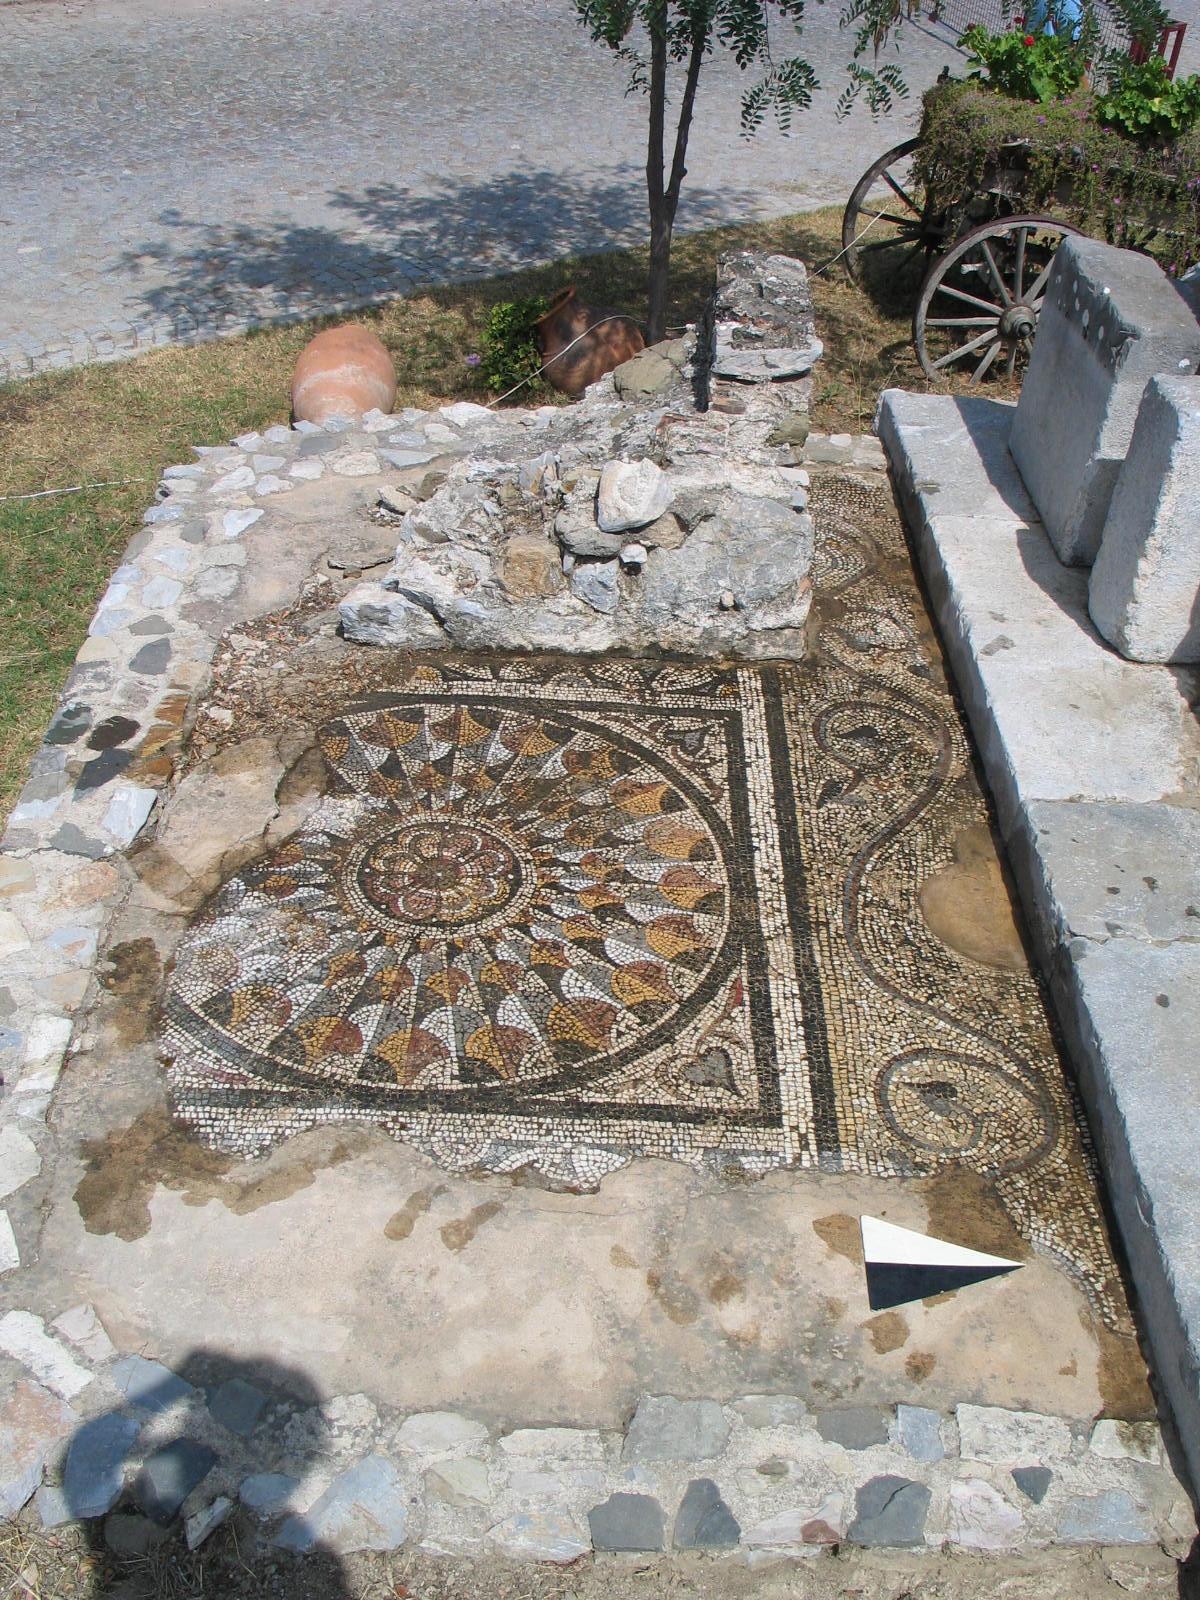 Fig. 7. Tomb 7 mosaic (B. Poulsen)